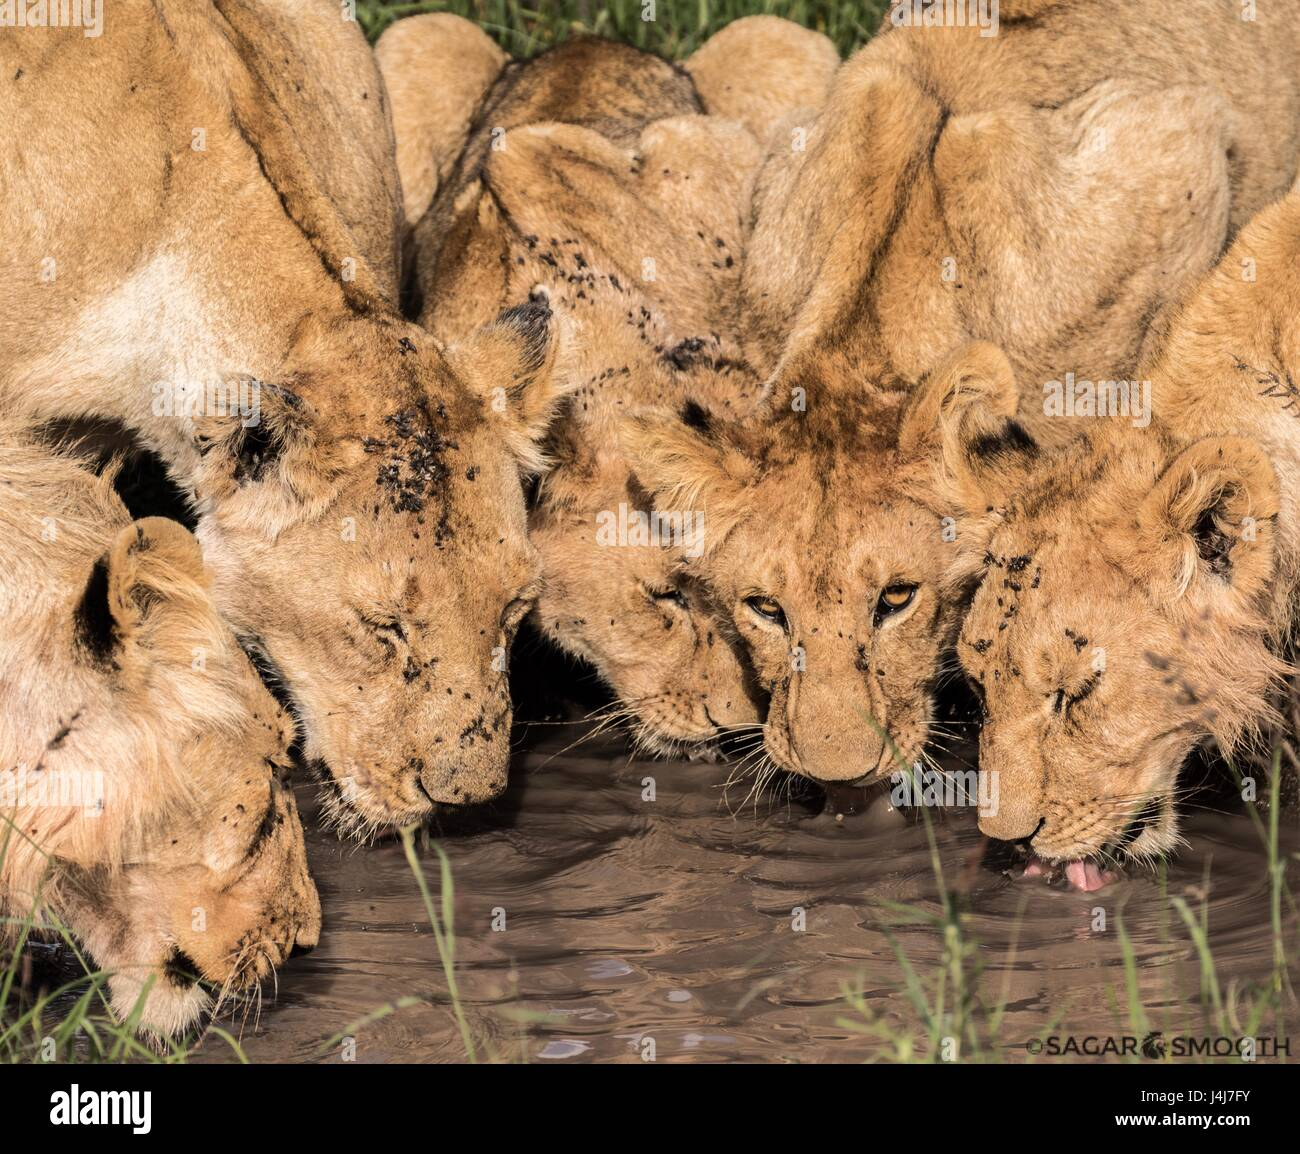 Hermosa fauna africana Imagen De Stock